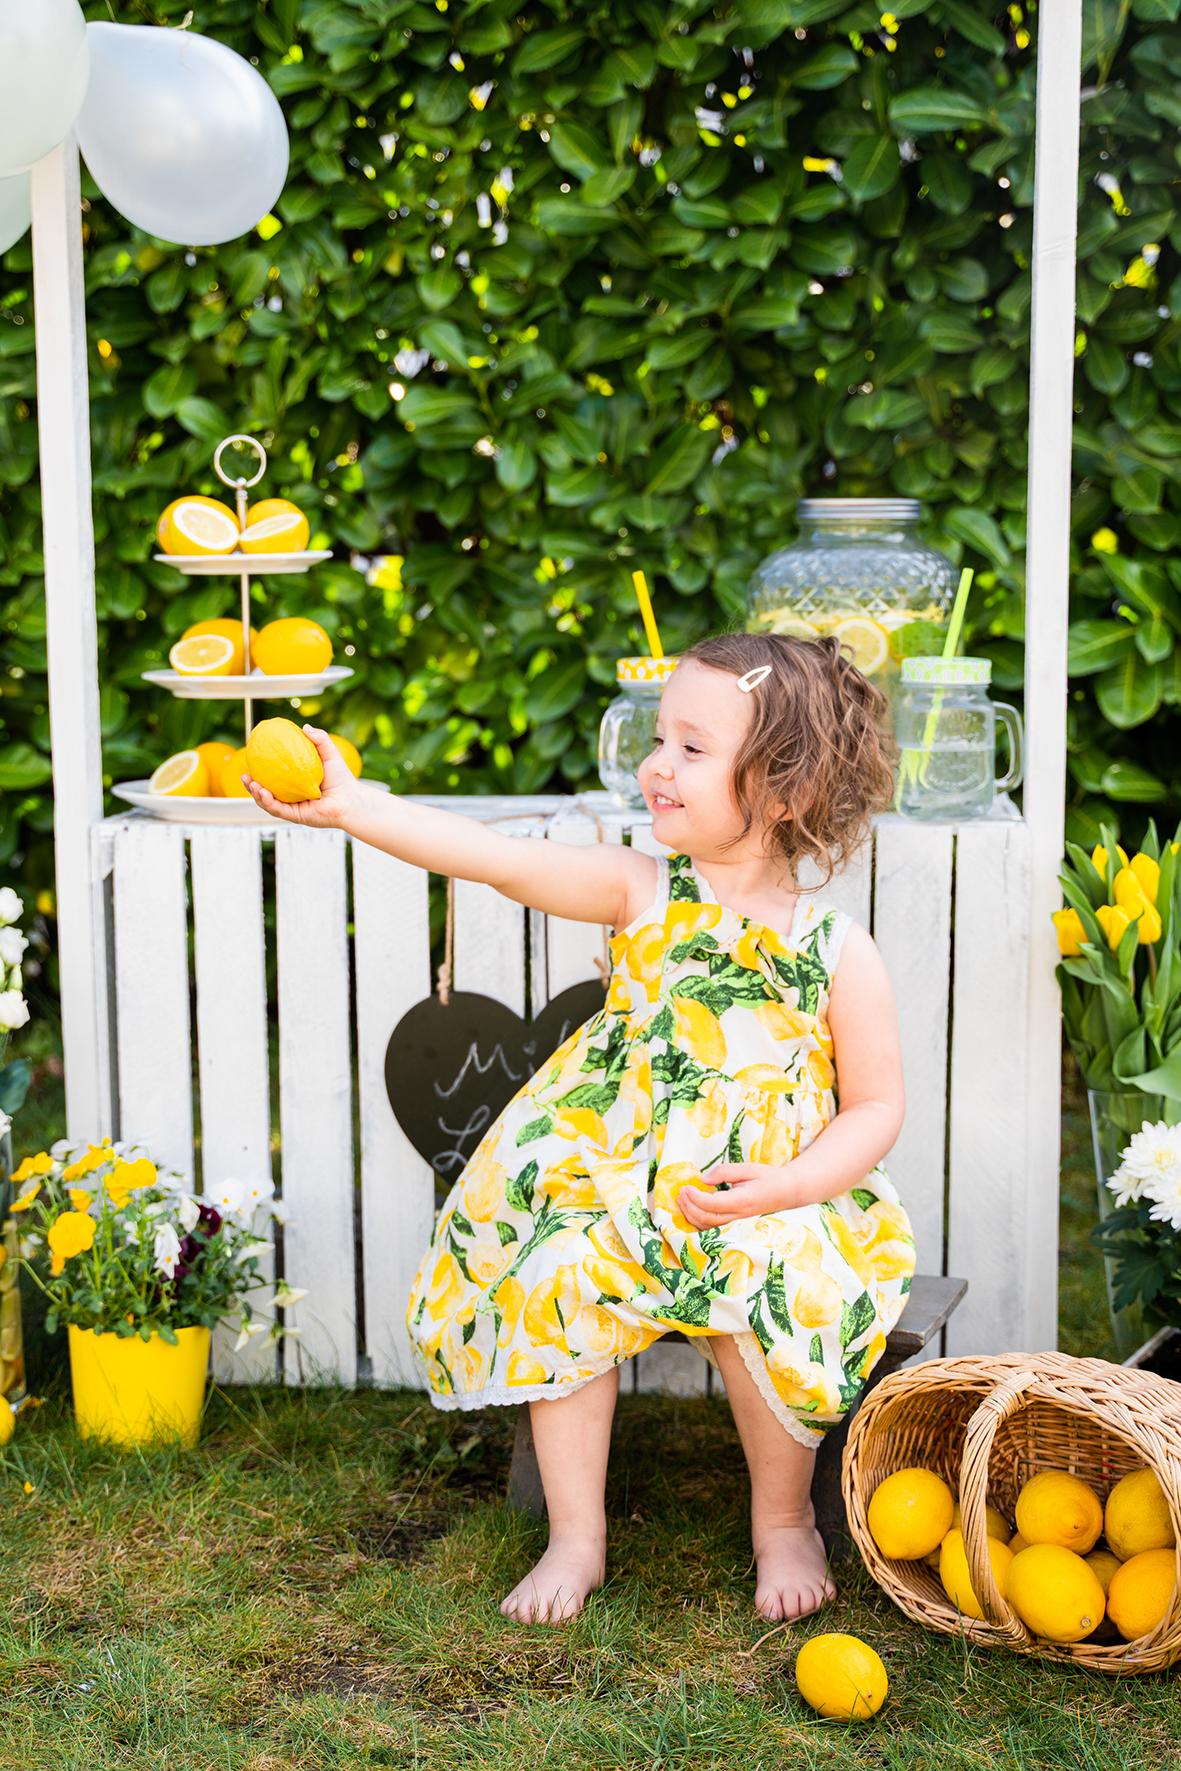 Stolze Limonadenstandbesitzerin bei der Arbeit Fotoshooting Bremen Fotostudio Babyfotograf